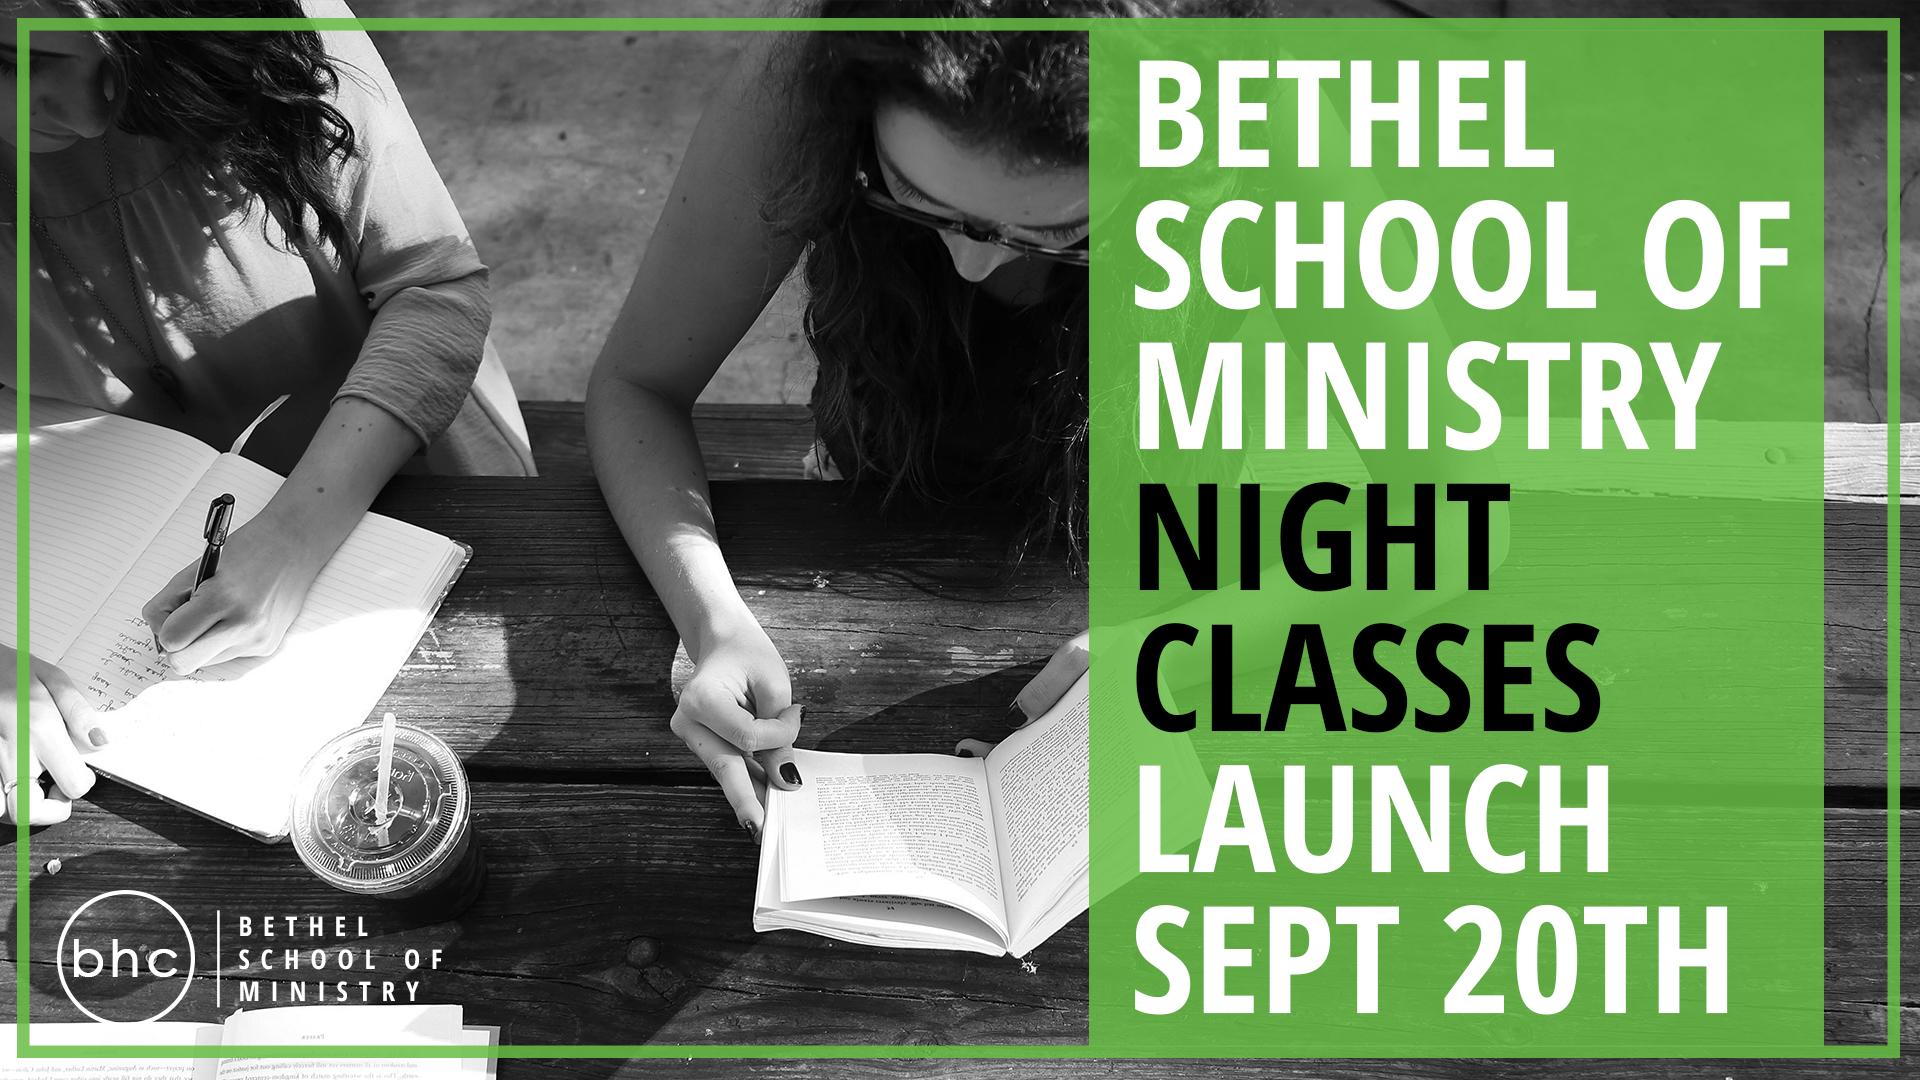 Bsom night classes launch